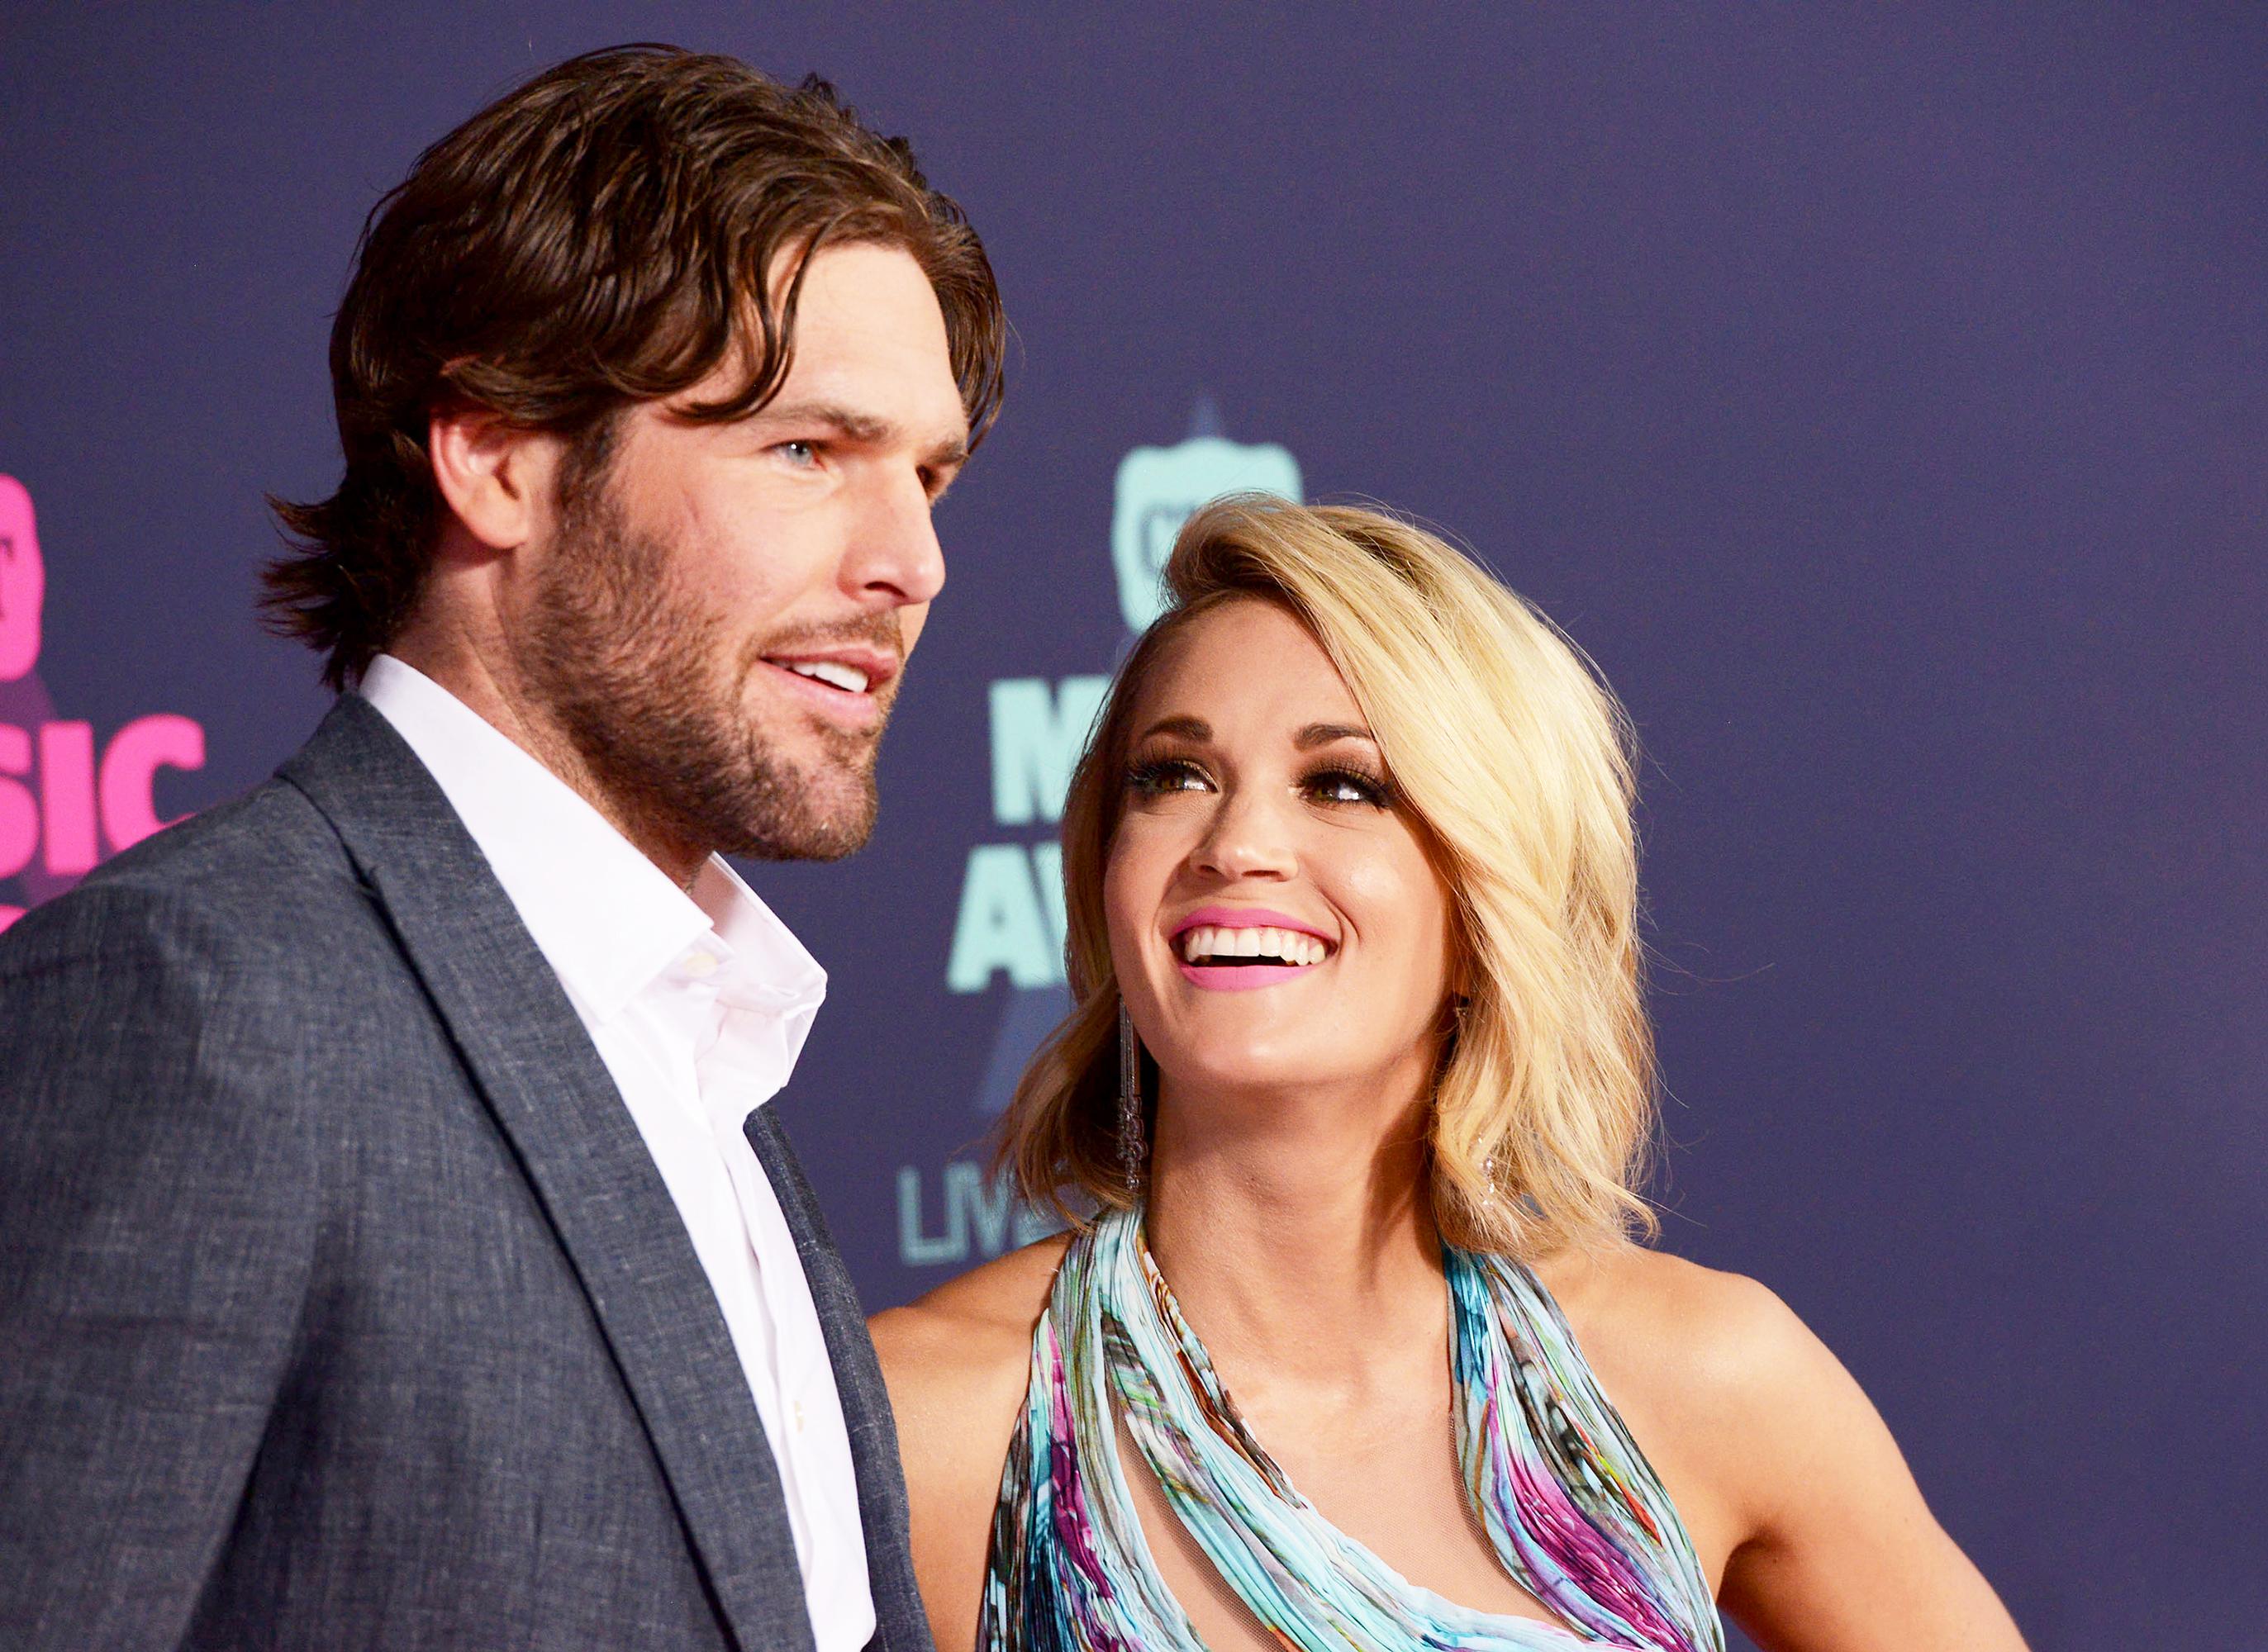 Mike Fisher Dating Carrie UnderwoodVitesse de datation Adelaide plus de 50